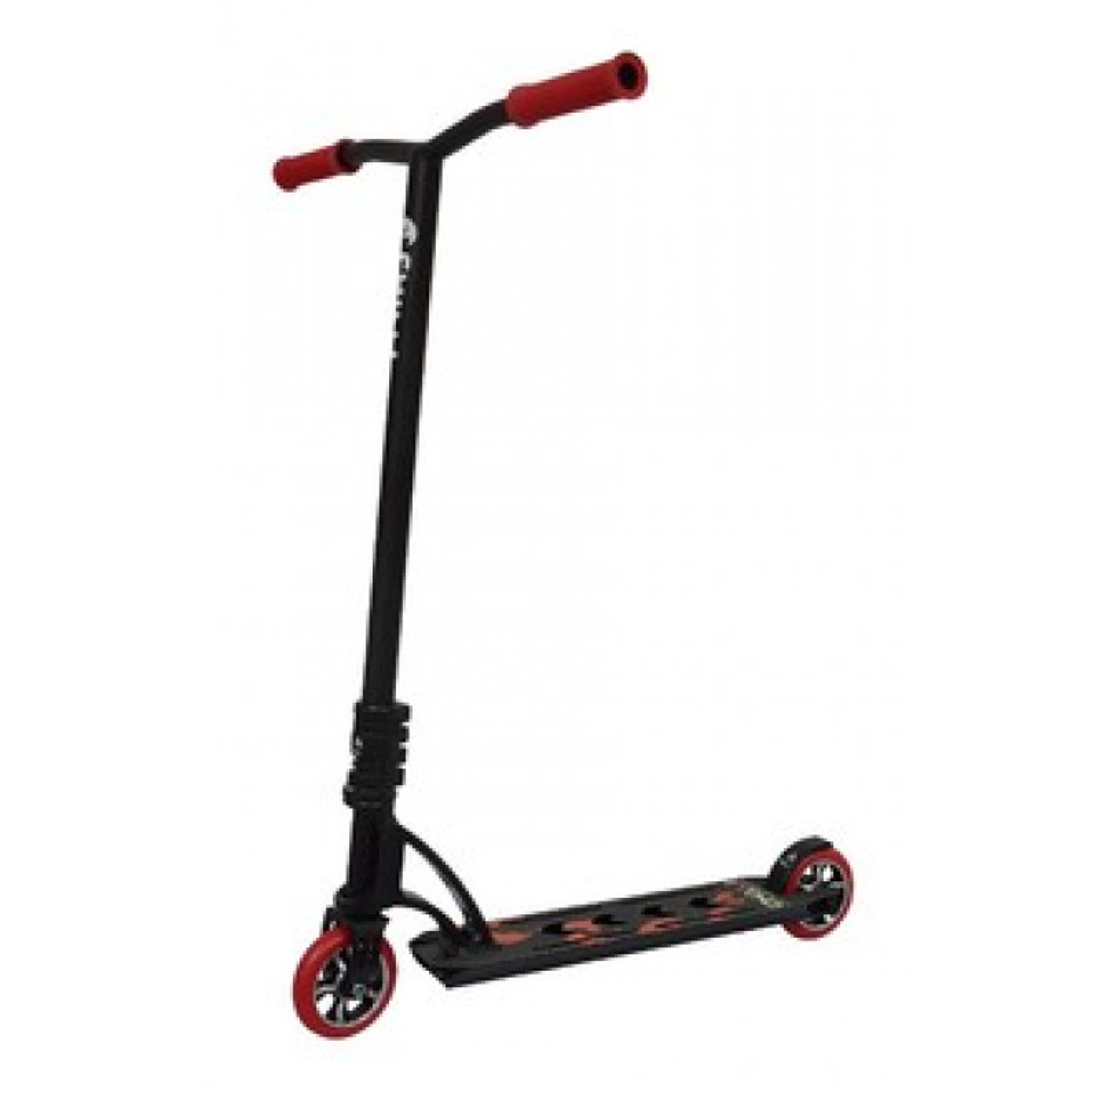 chilli scooter 7100 110mm sportmania. Black Bedroom Furniture Sets. Home Design Ideas